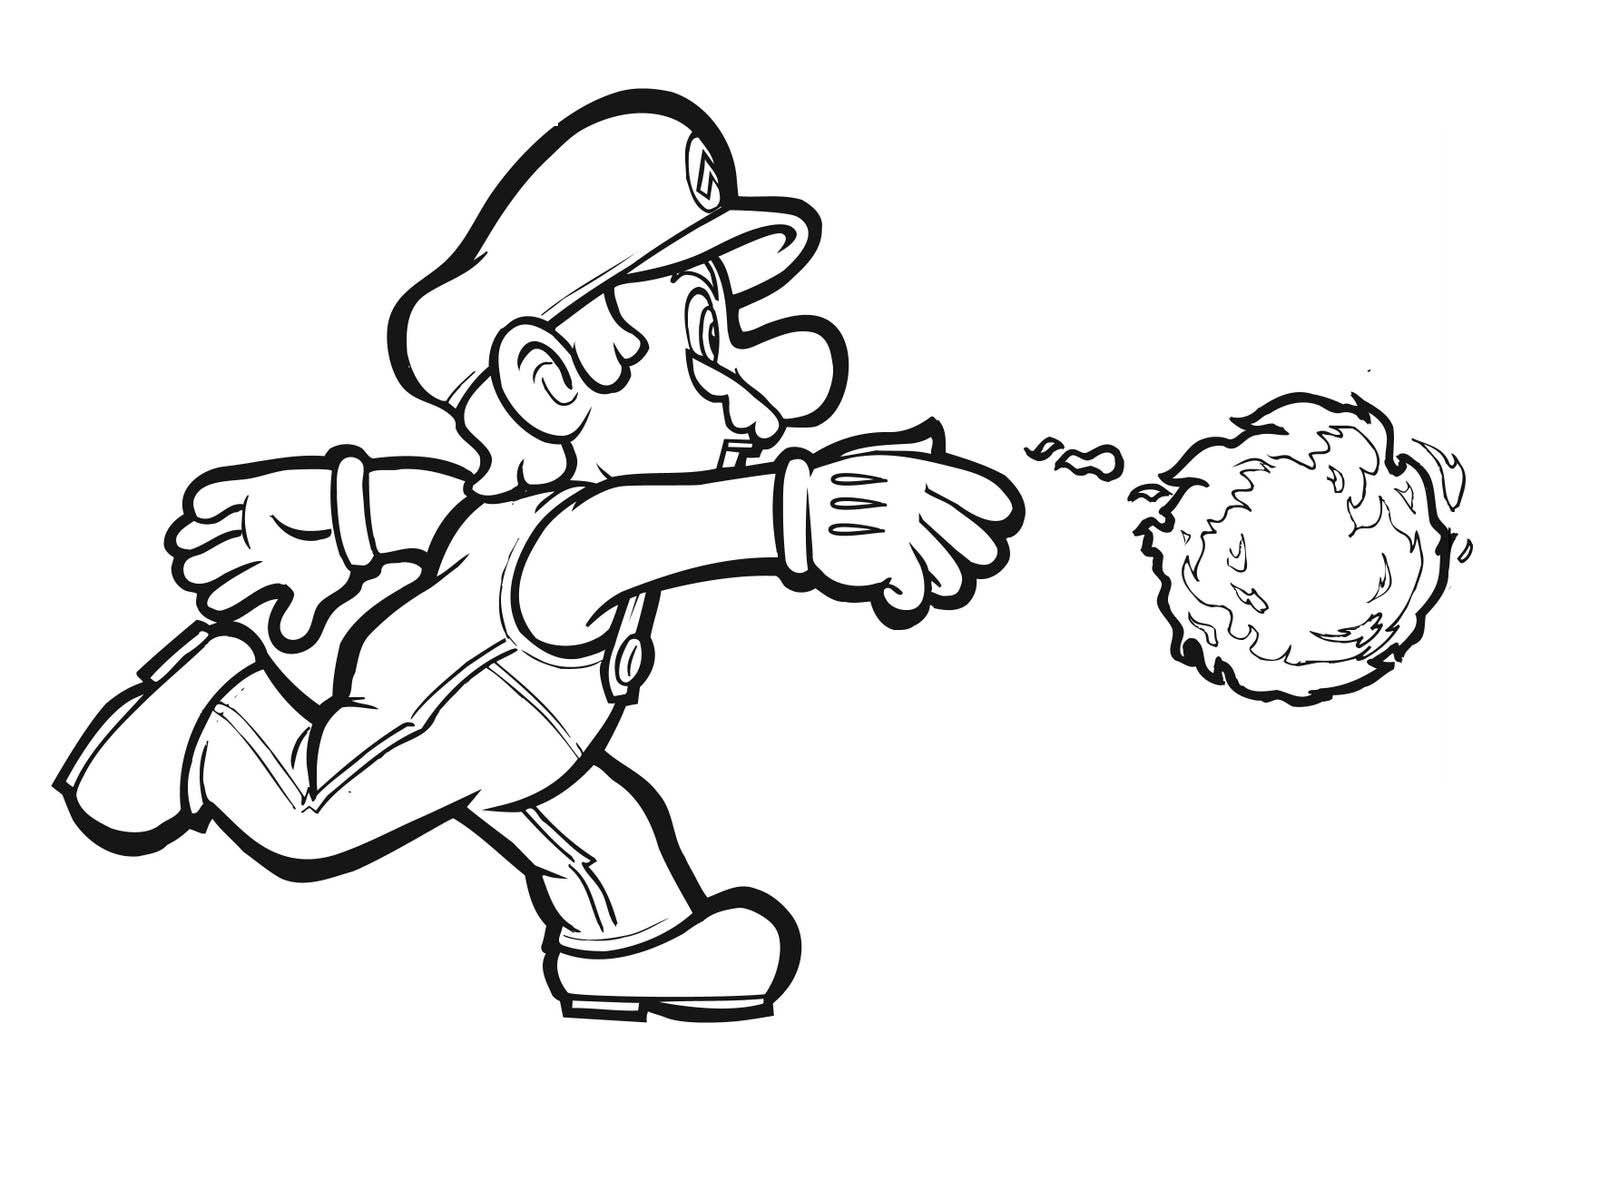 Free Mario Bros Coloring Pages | kids | Pinterest | Mario bros ...